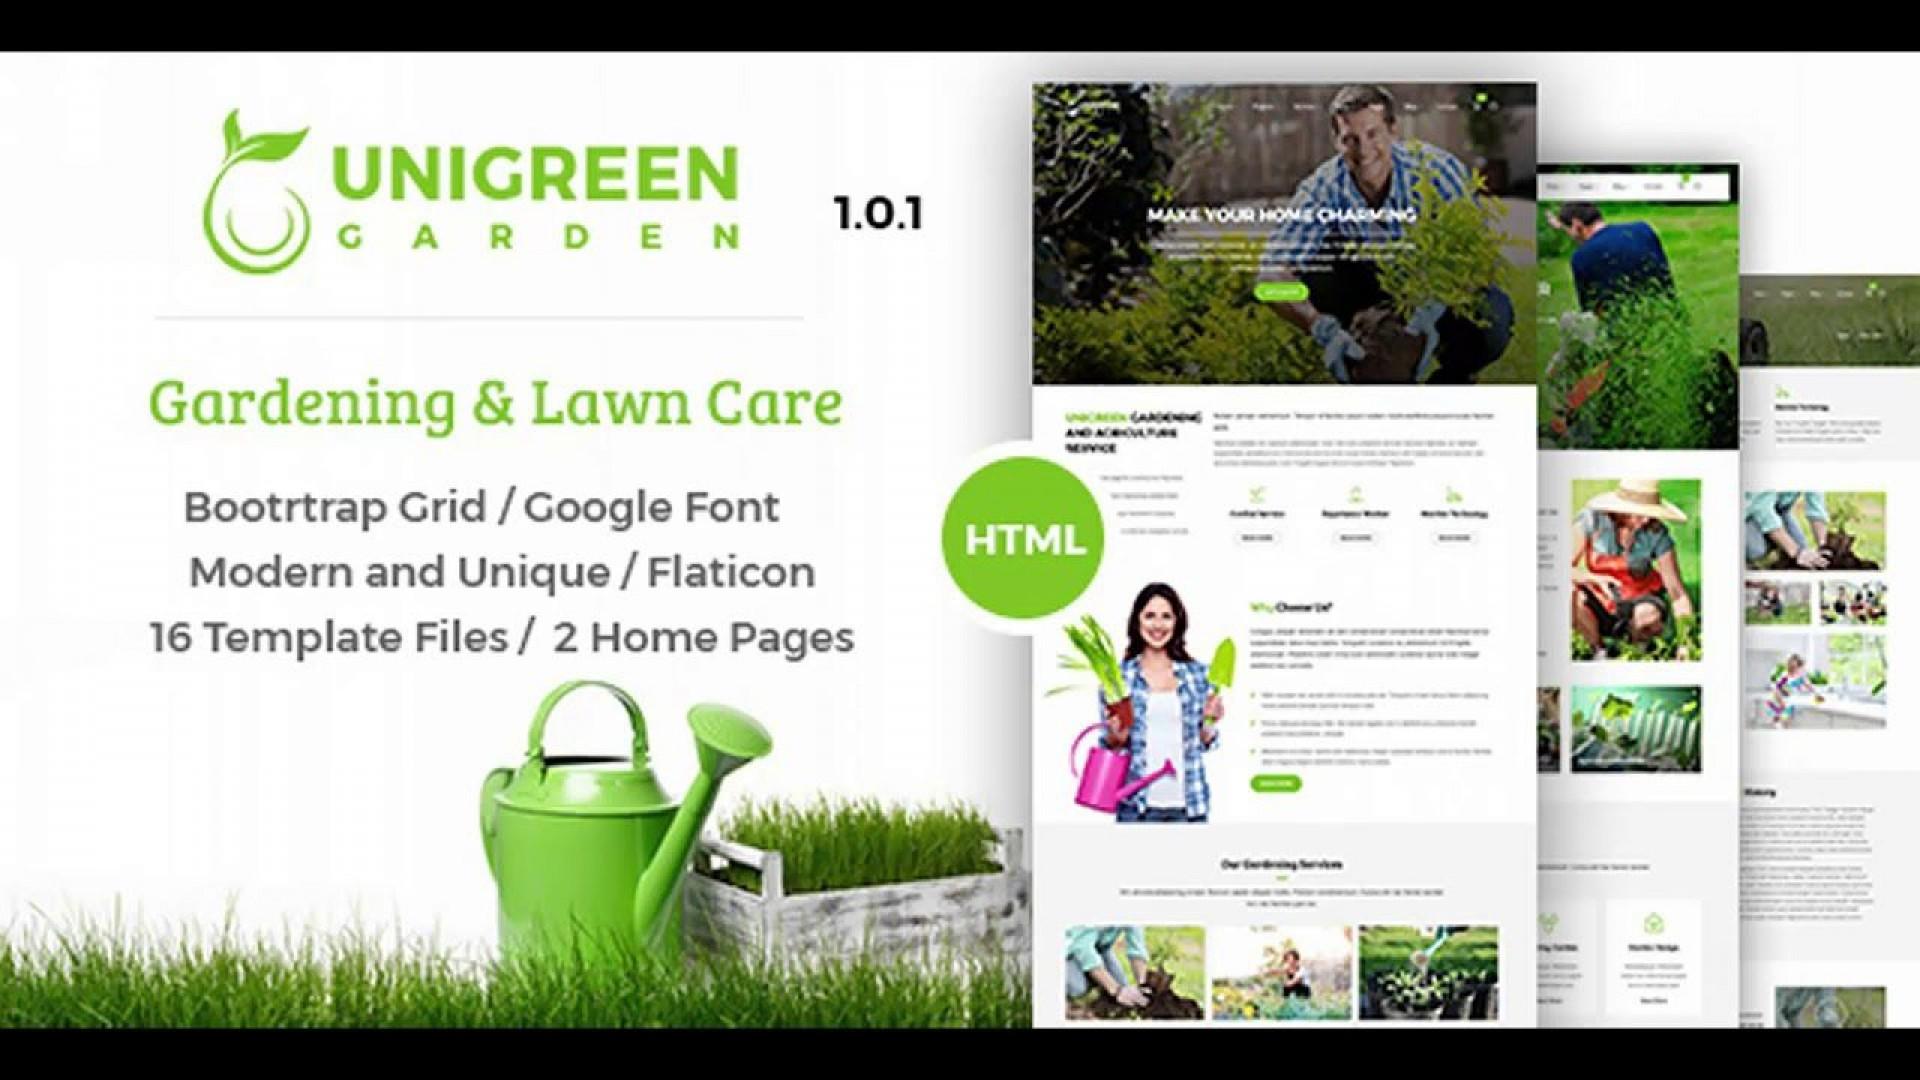 009 Stupendou Lawn Care Website Template Inspiration 1920